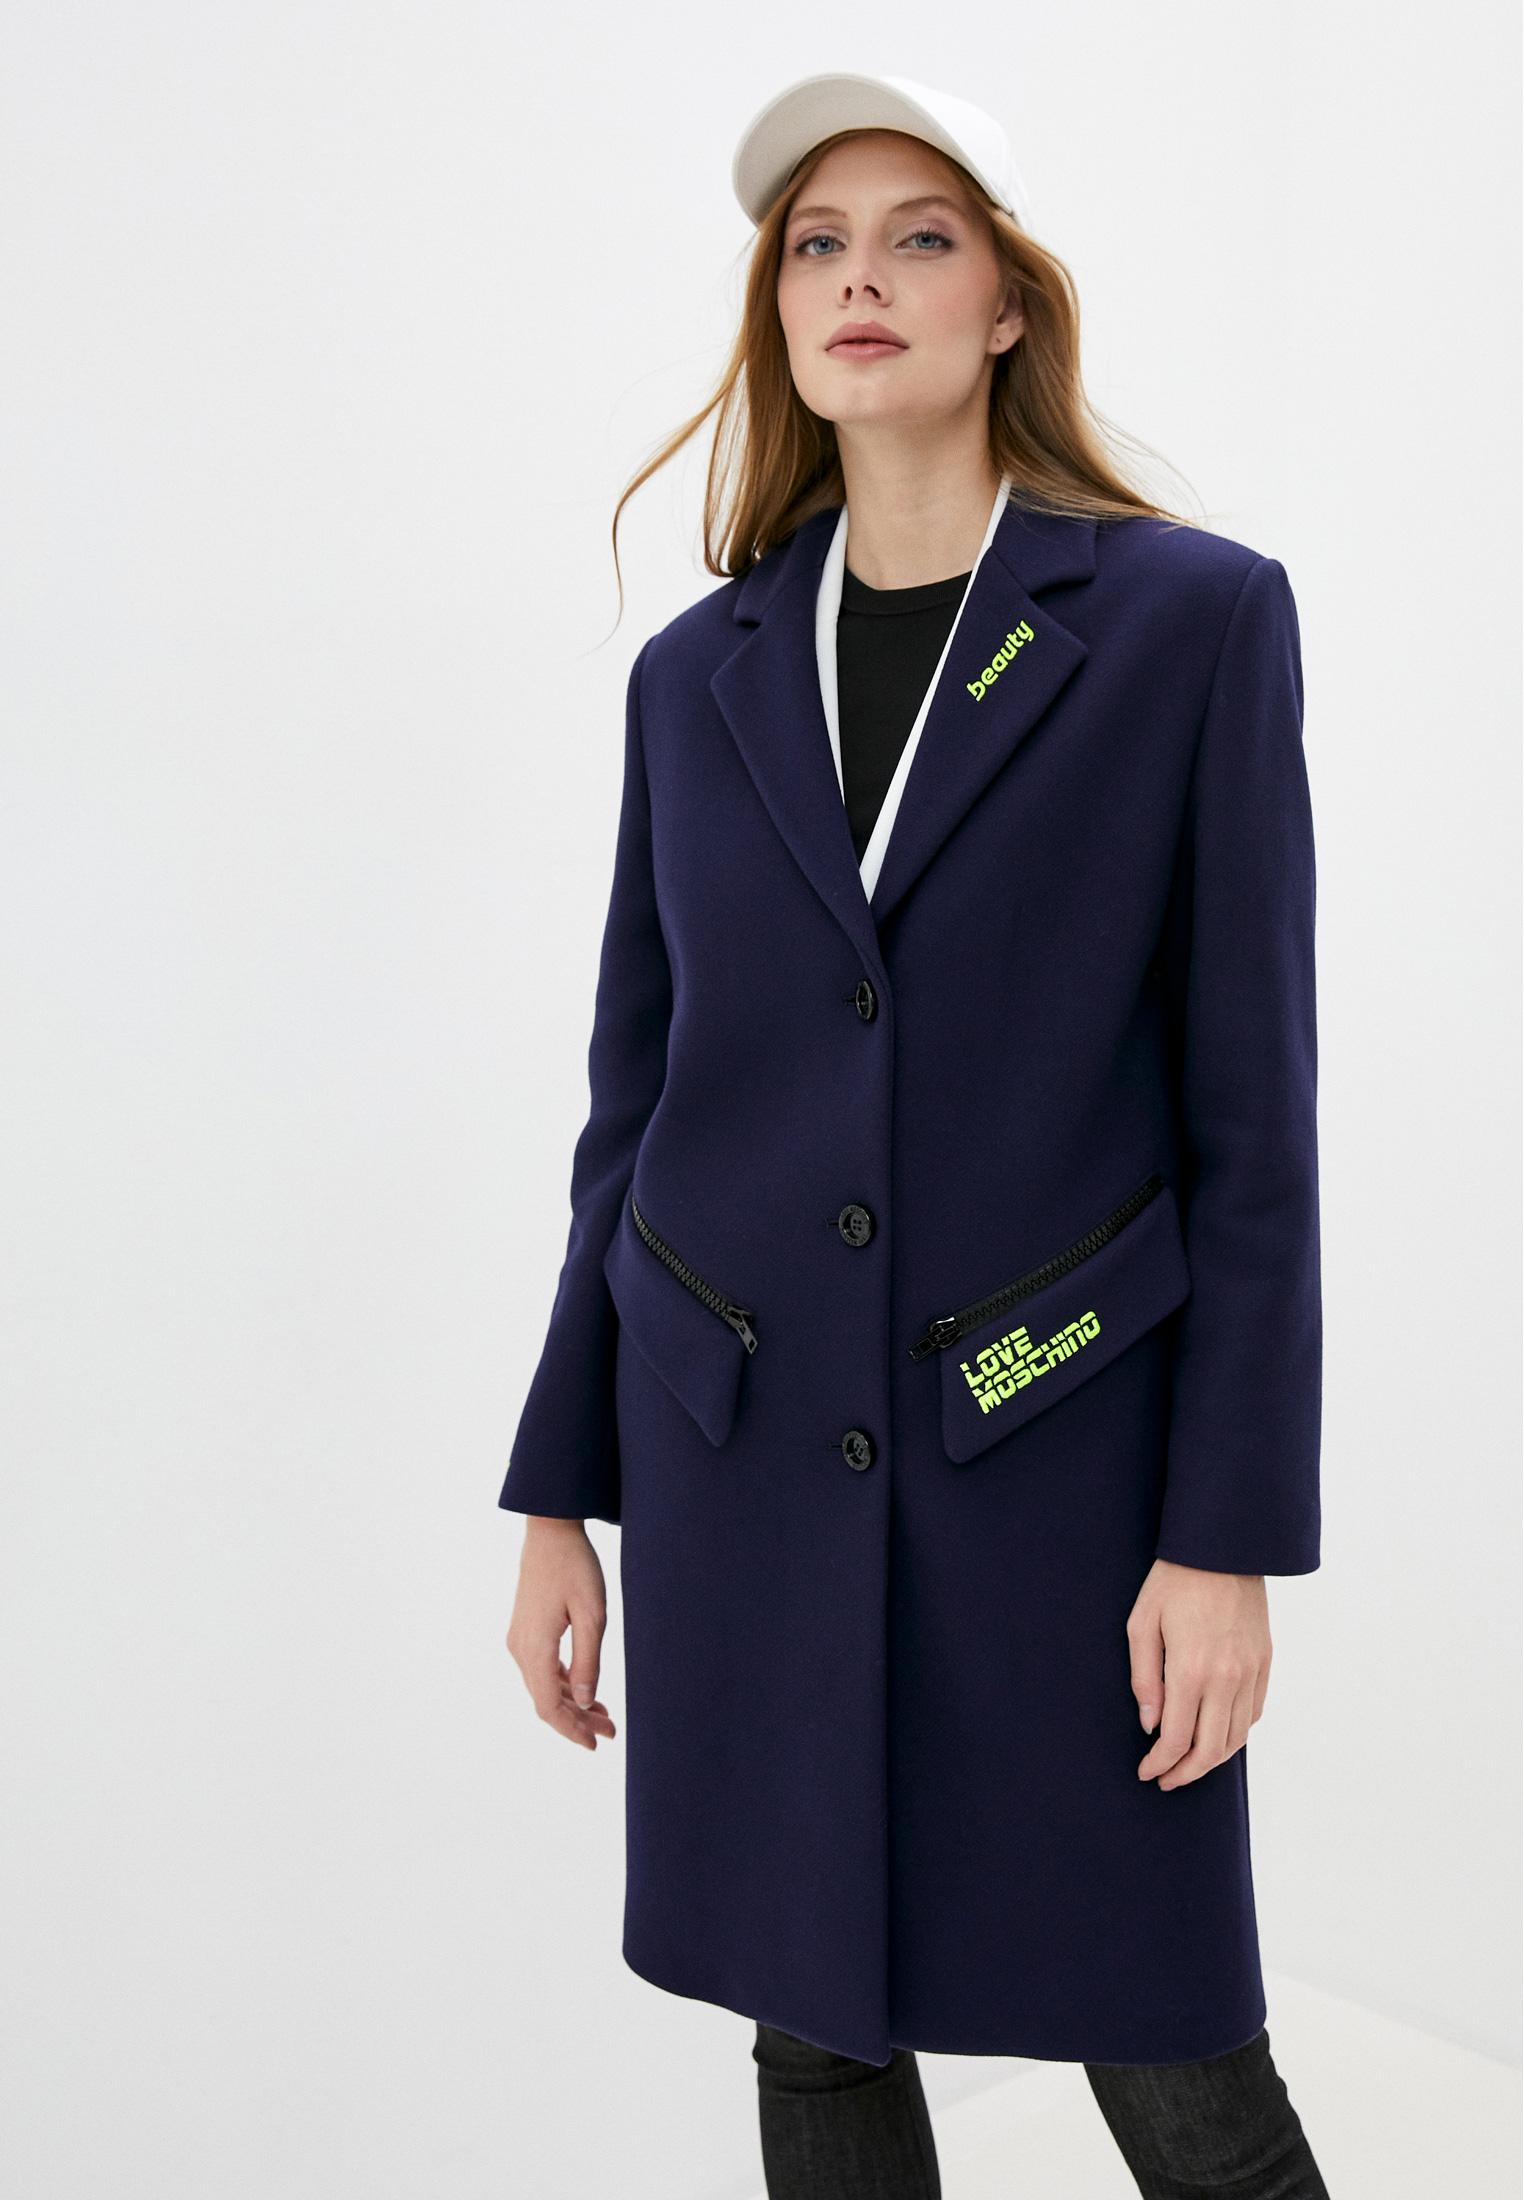 Женские пальто Love Moschino (Лав Москино) W K 492 01 T 008A